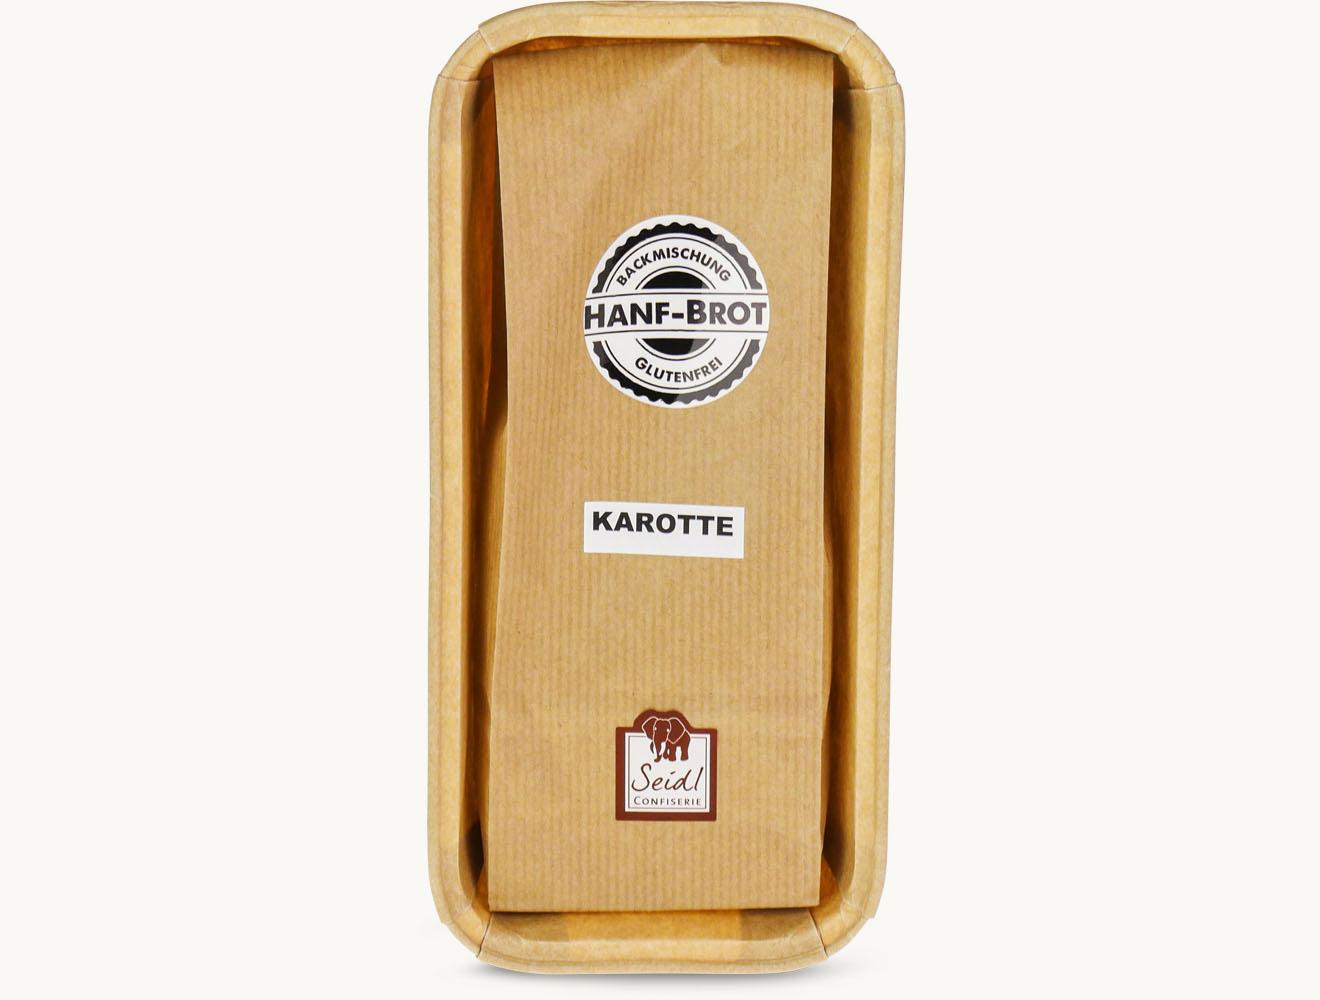 Backmischung Brot Hanf Karotte